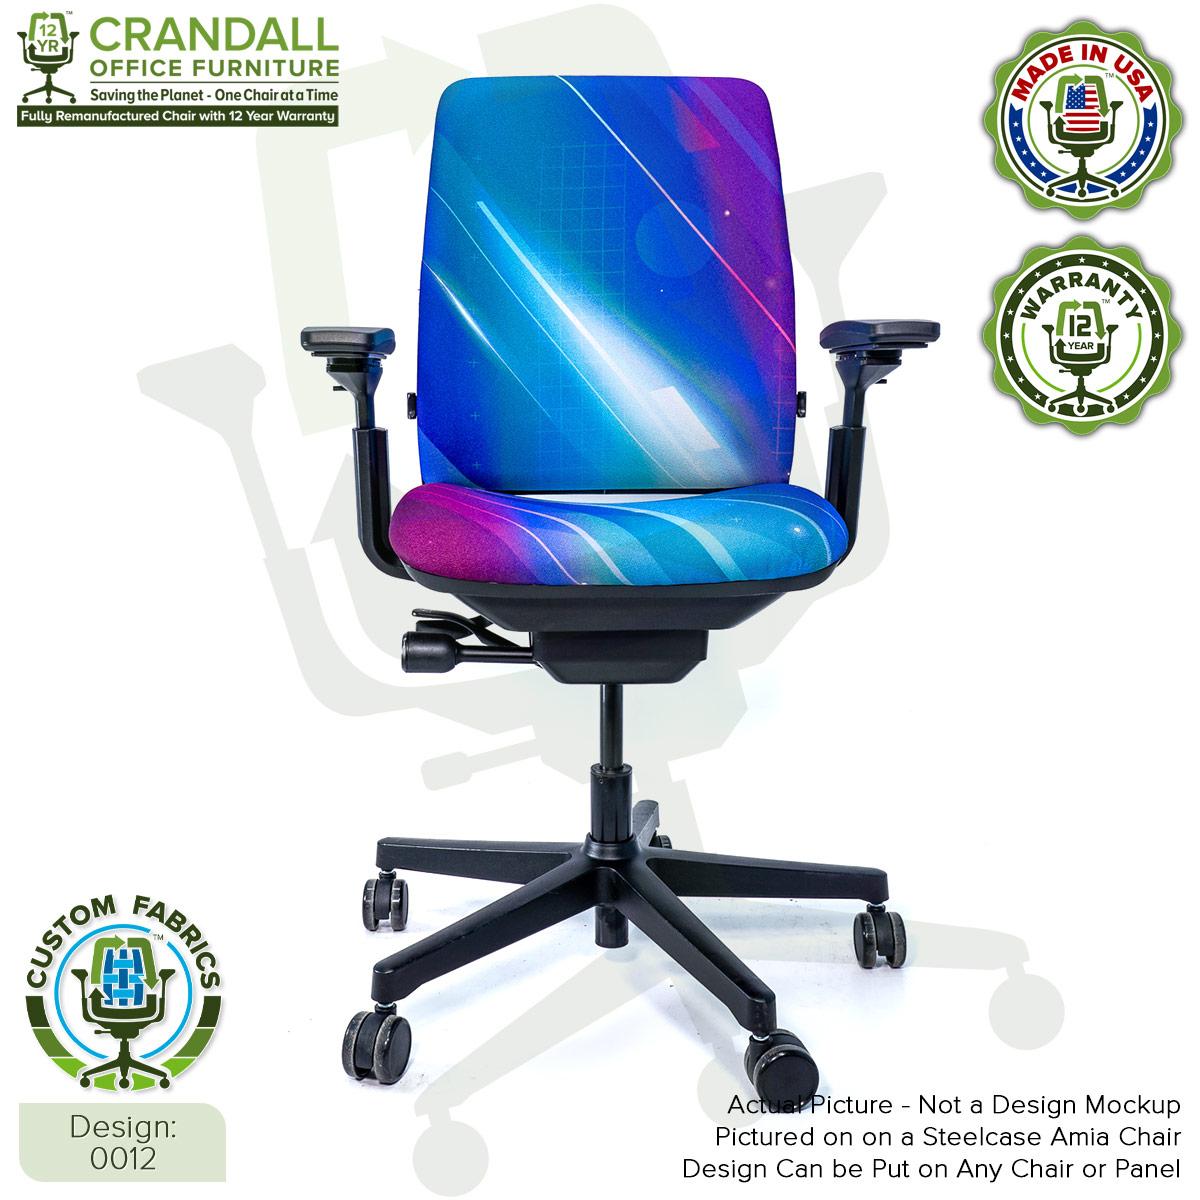 Custom Fabric Remanufactured Steelcase Amia Chair - Design 0012